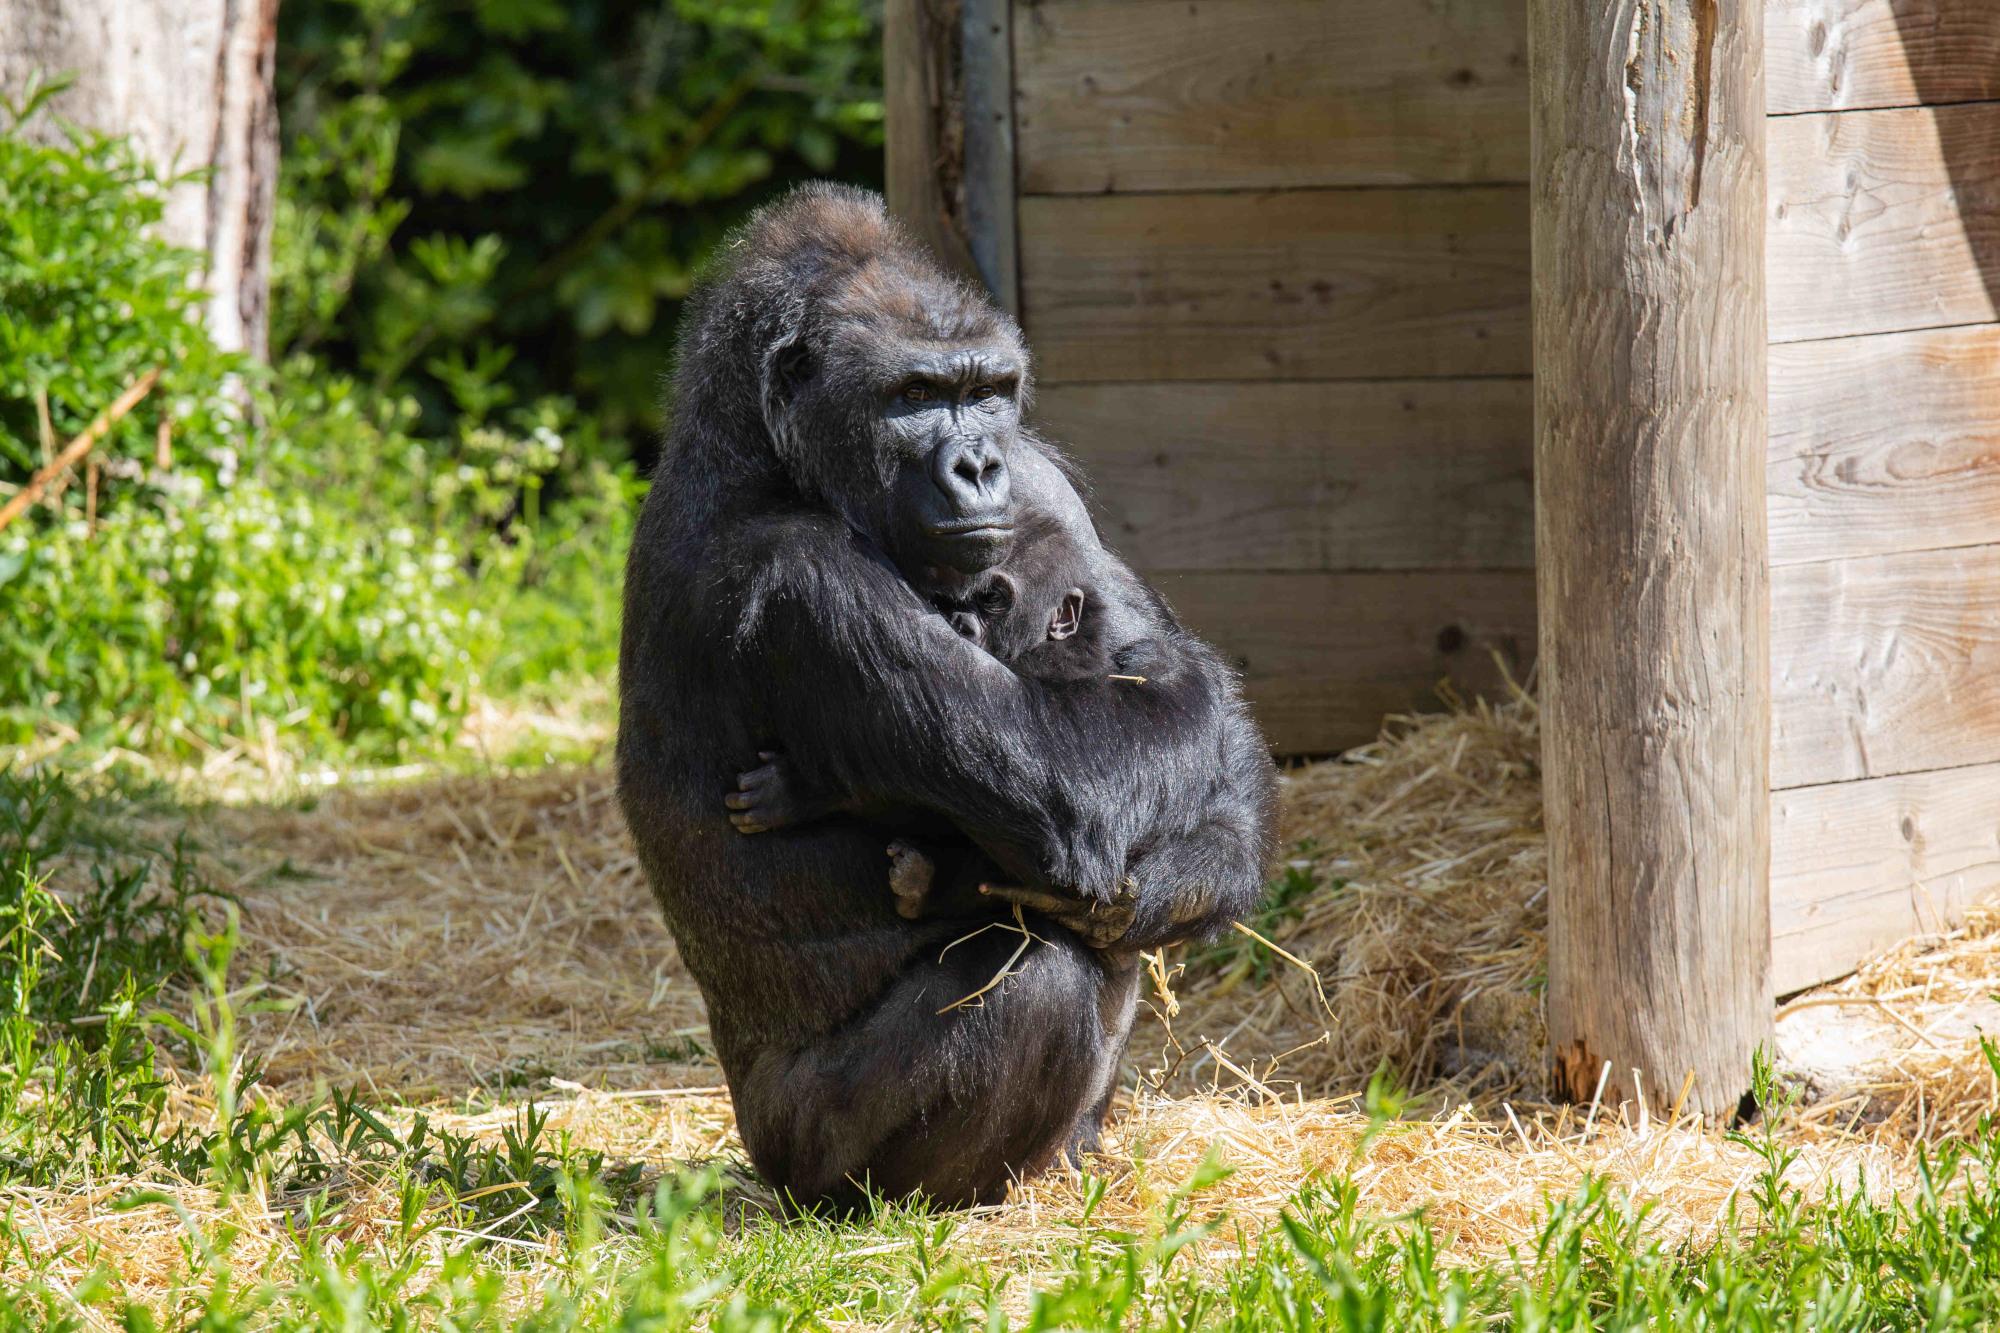 VIDEO: Surrogate Mom Raises Baby Gorilla